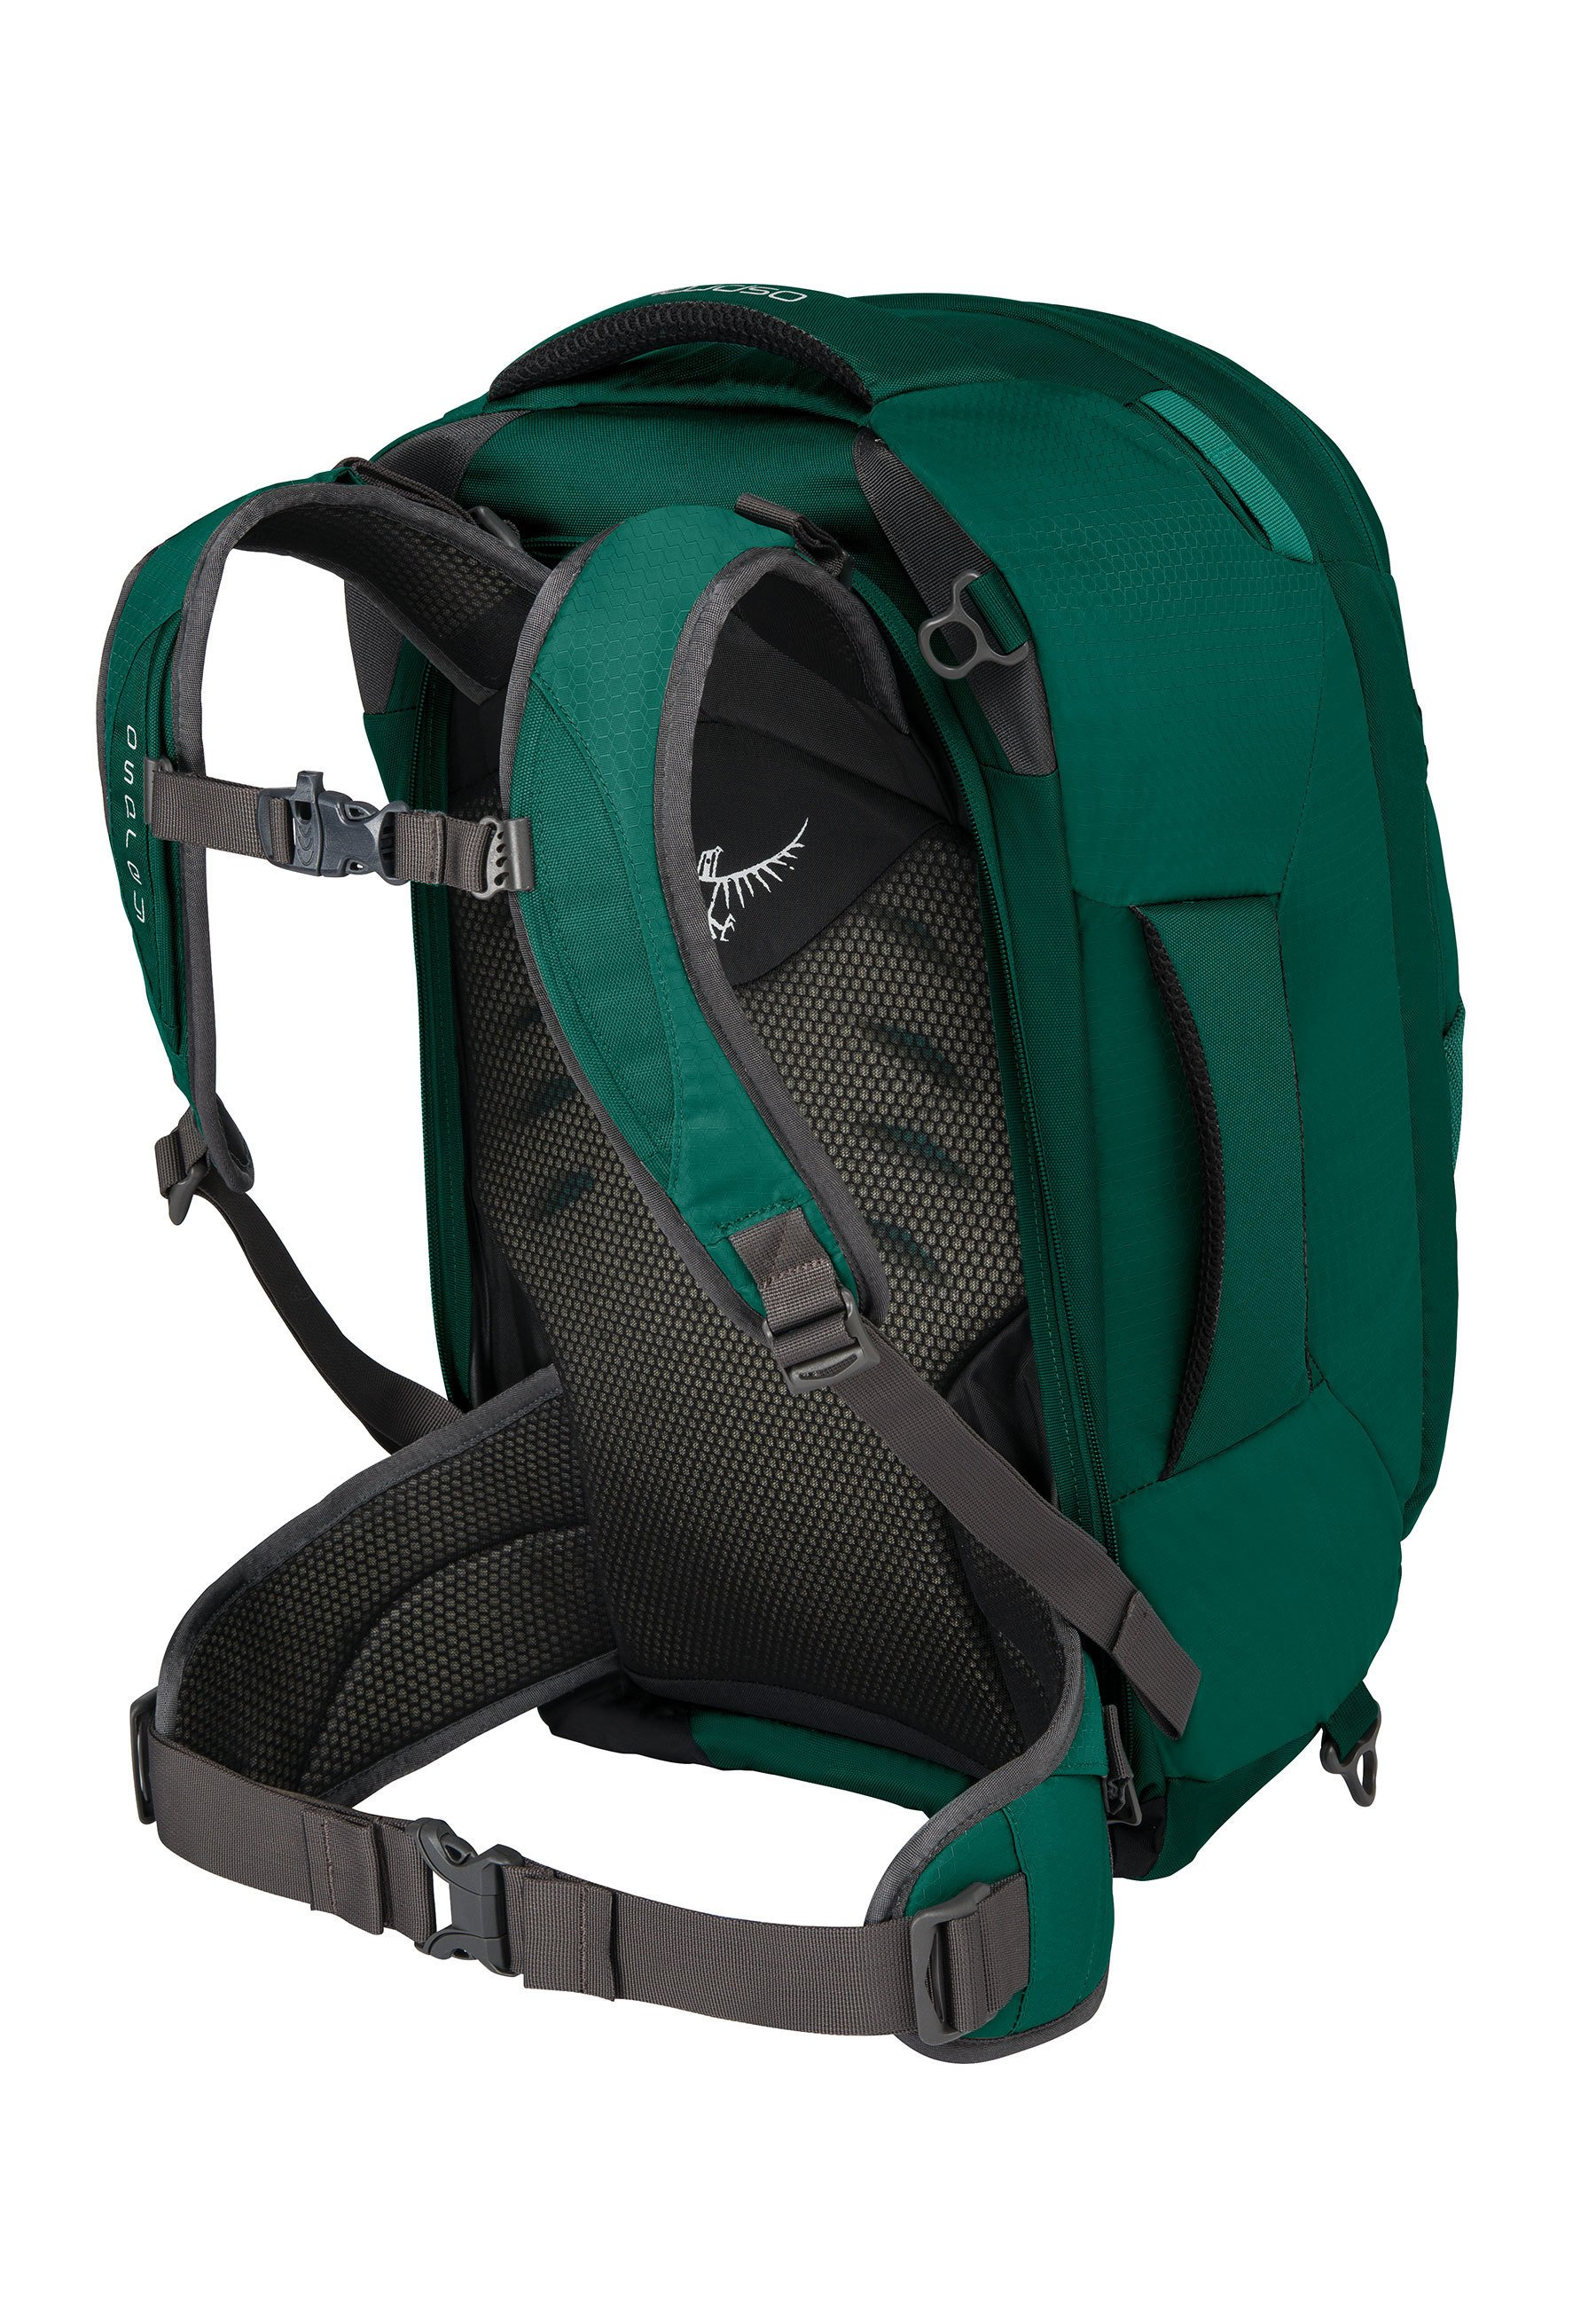 Quality Outlet Osprey Rucksack - rainforest green | women's accessories 2020 cIRrL